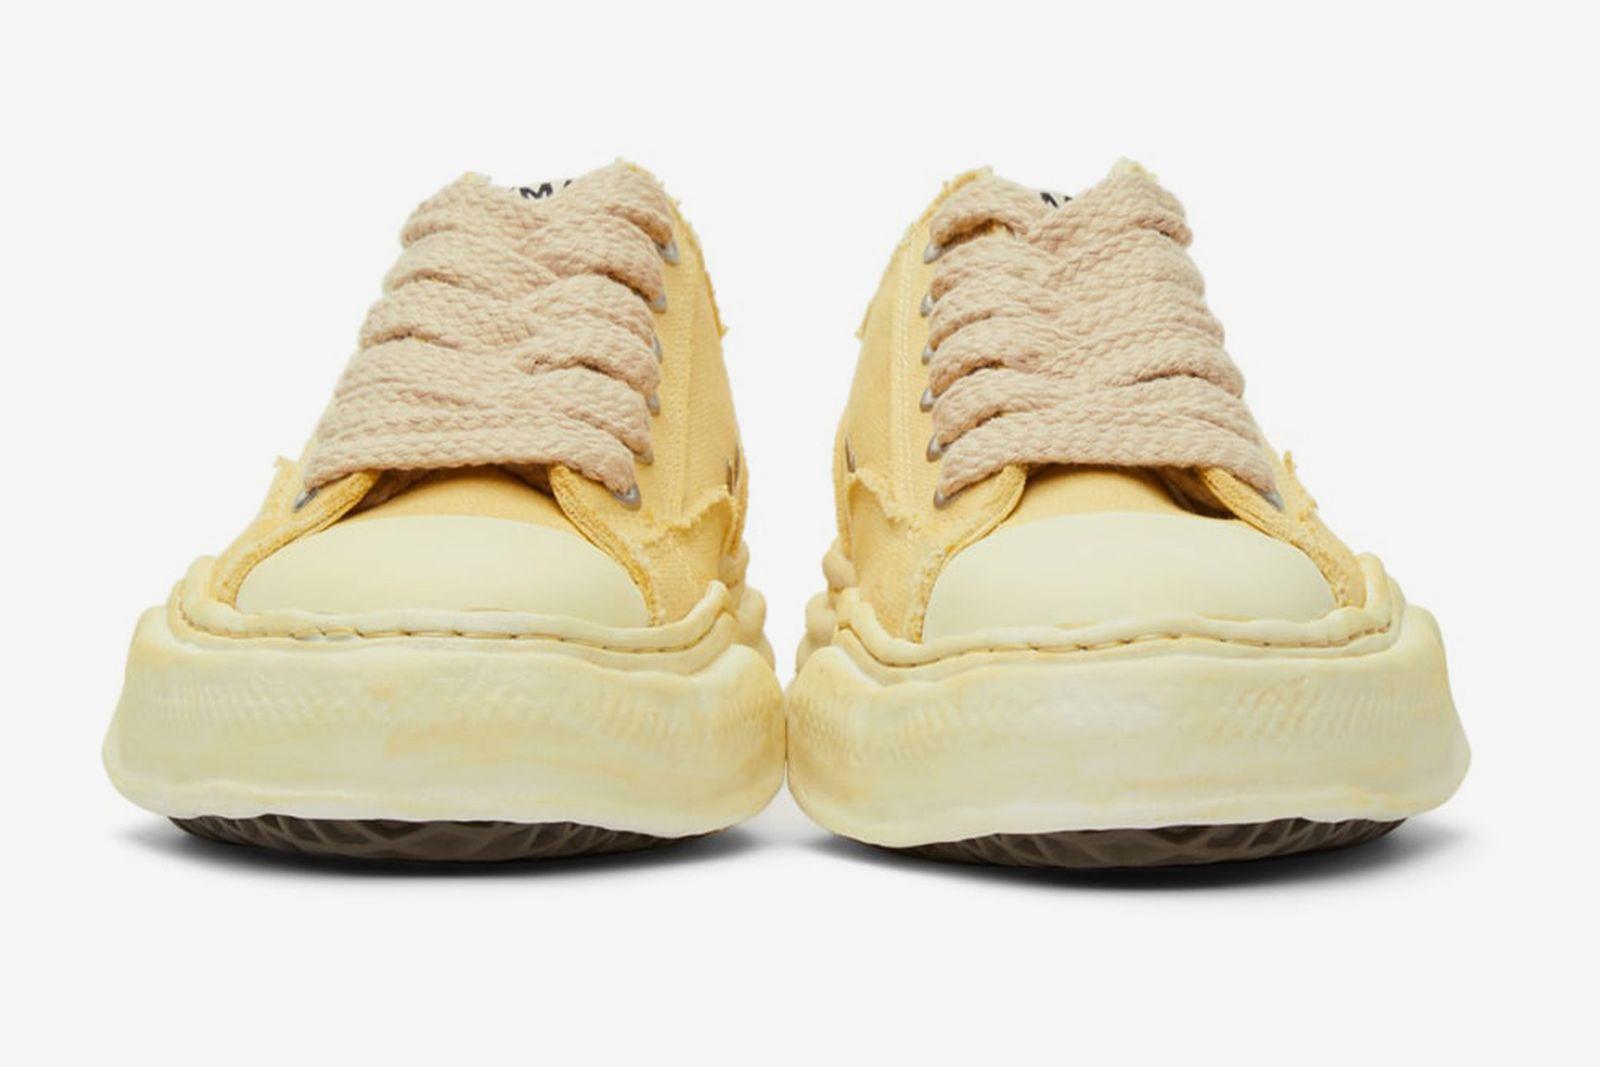 sneakers on sale